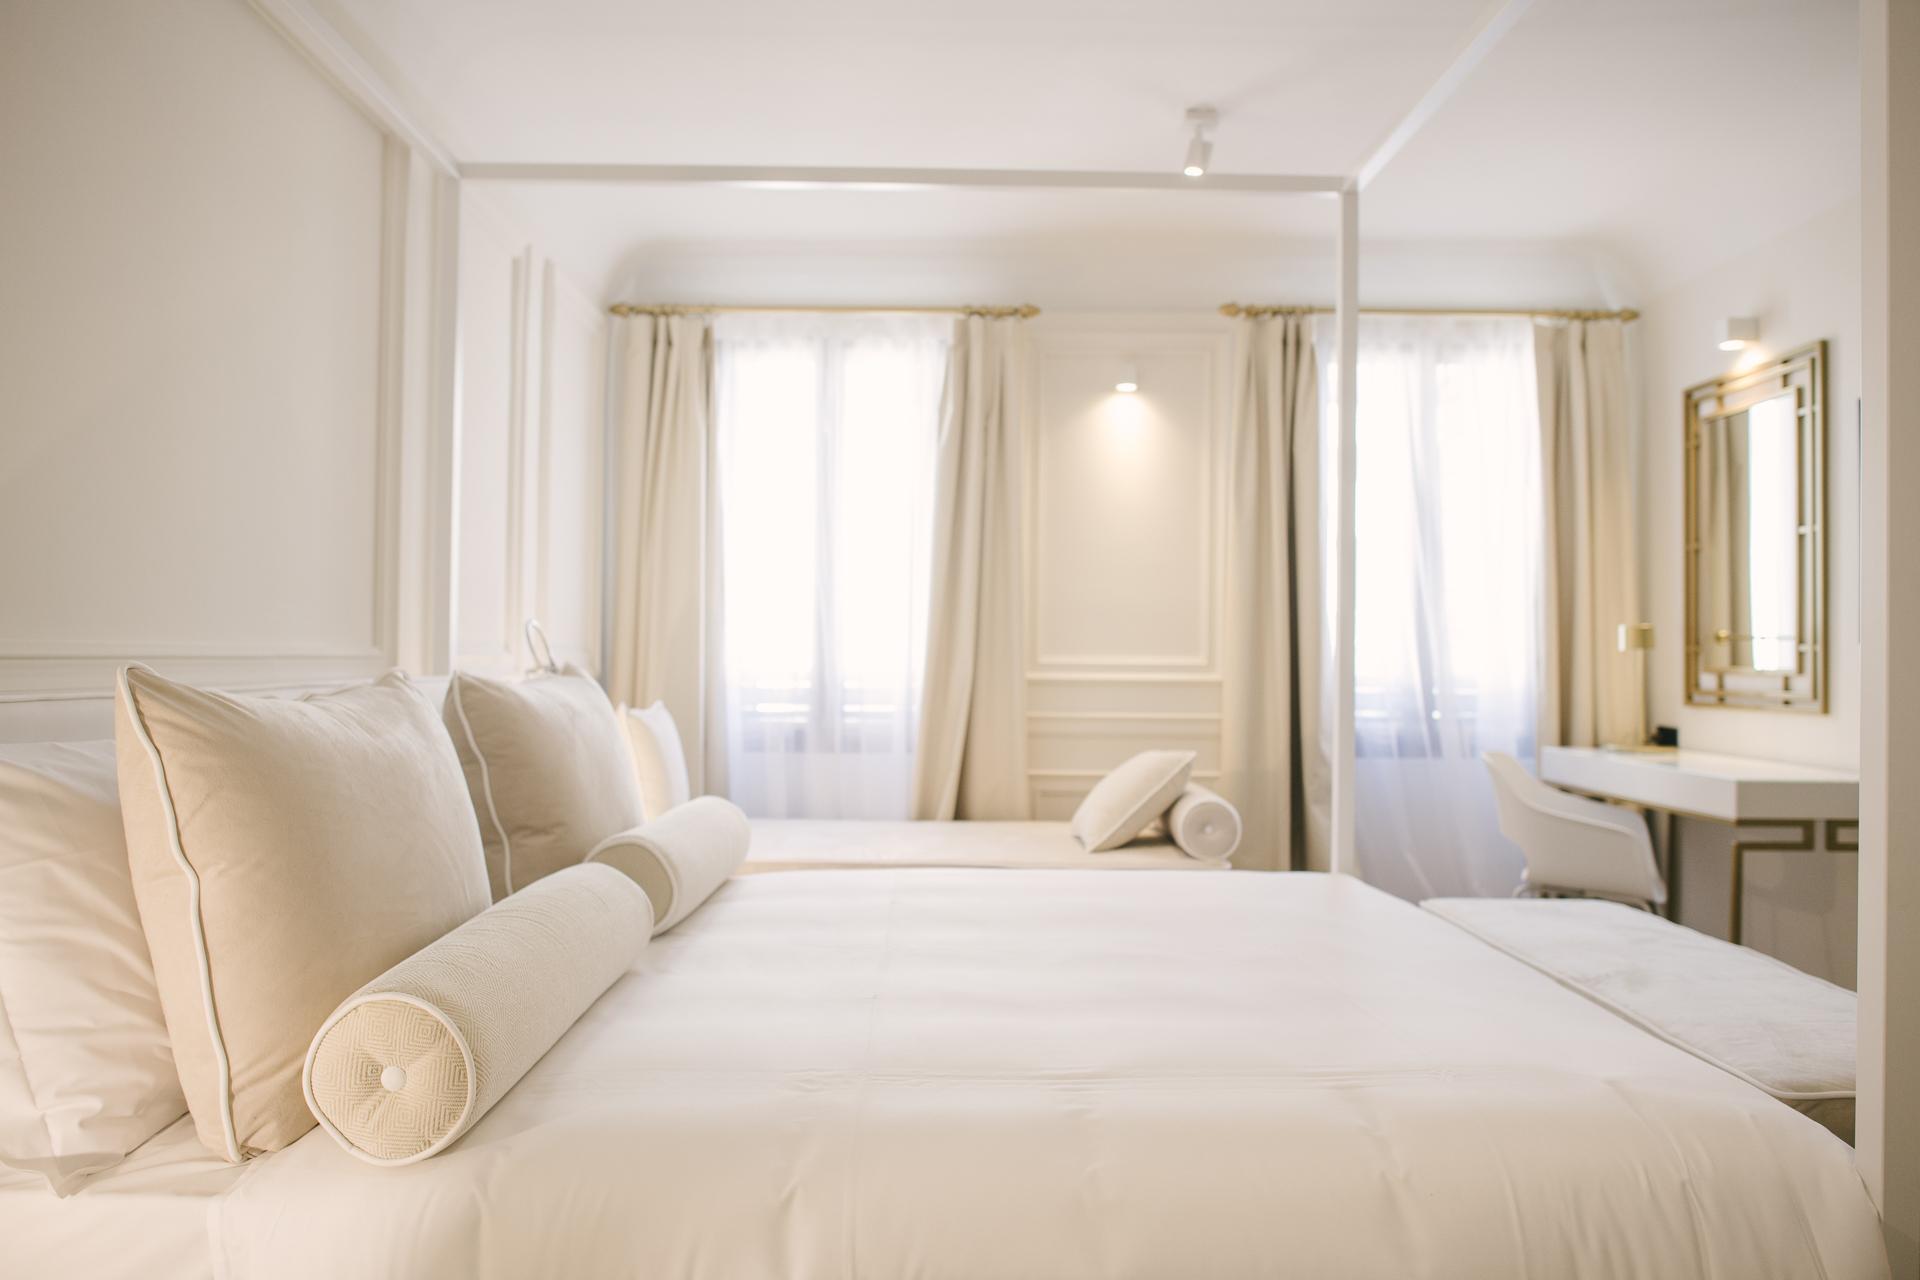 nuova img camere e suites